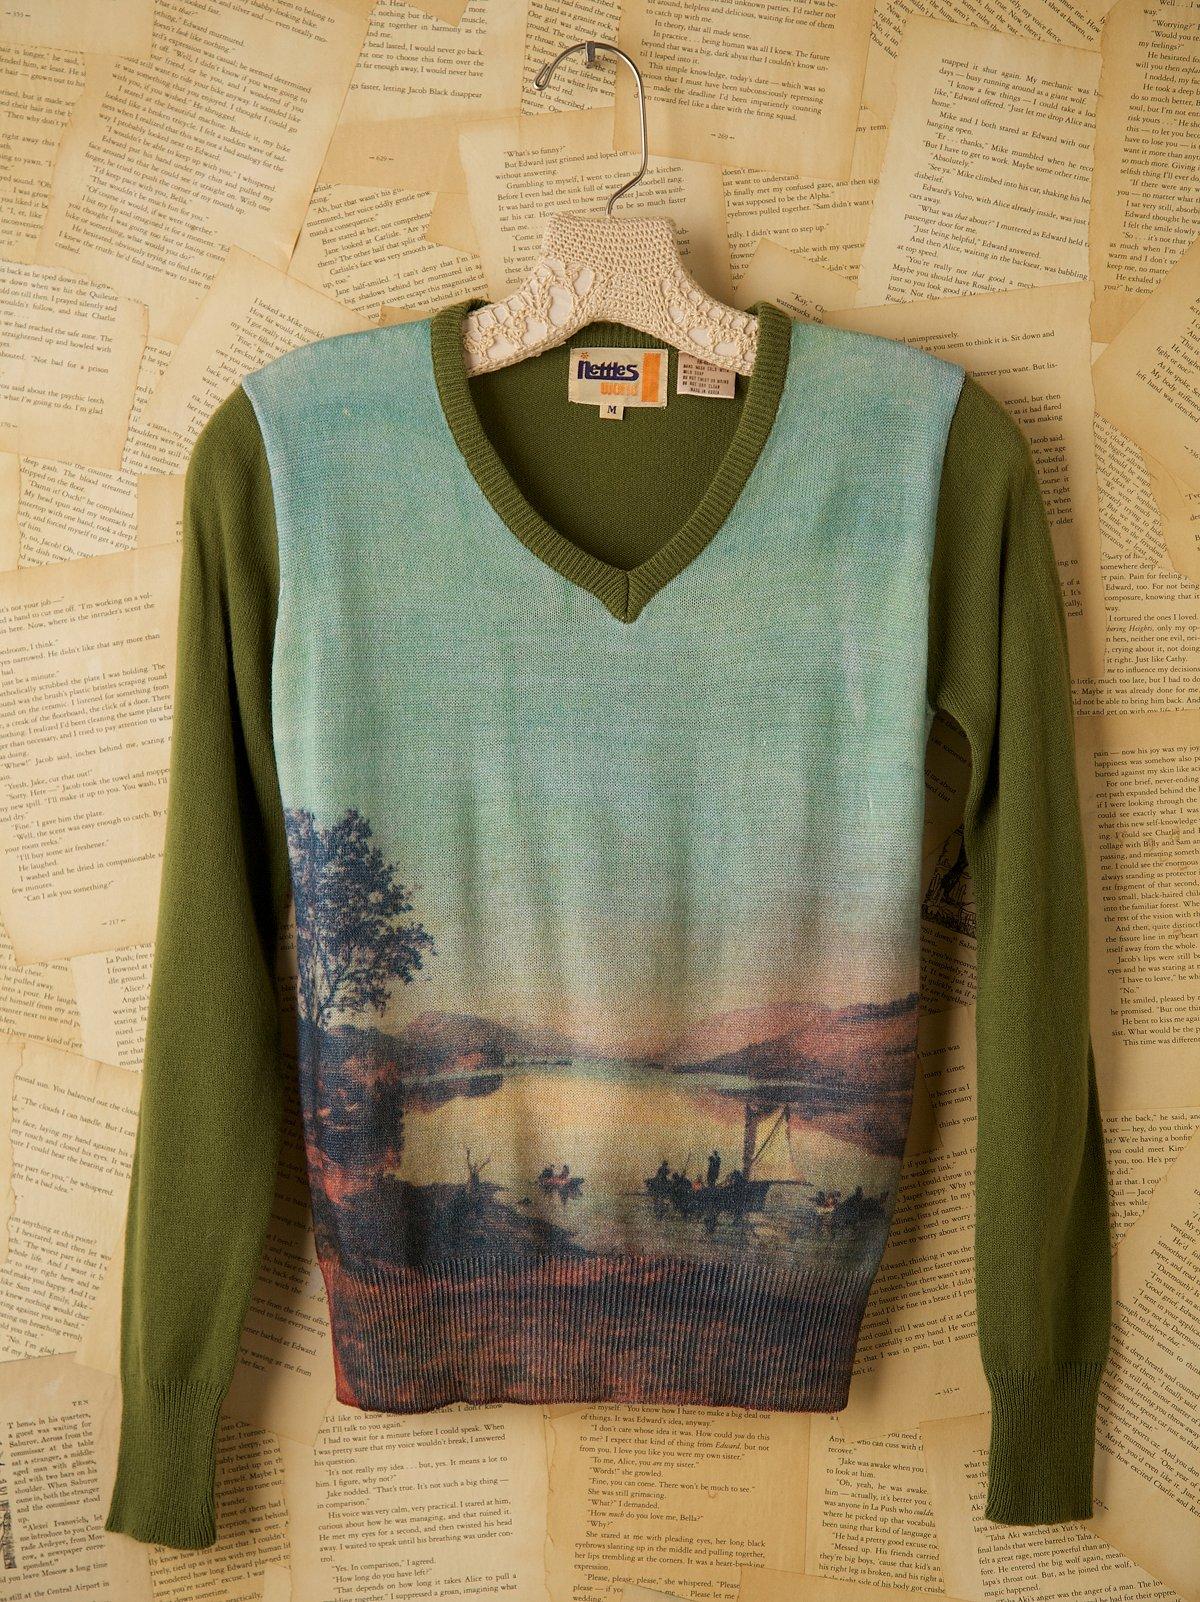 Vintage Green Sweater with Landscape Design